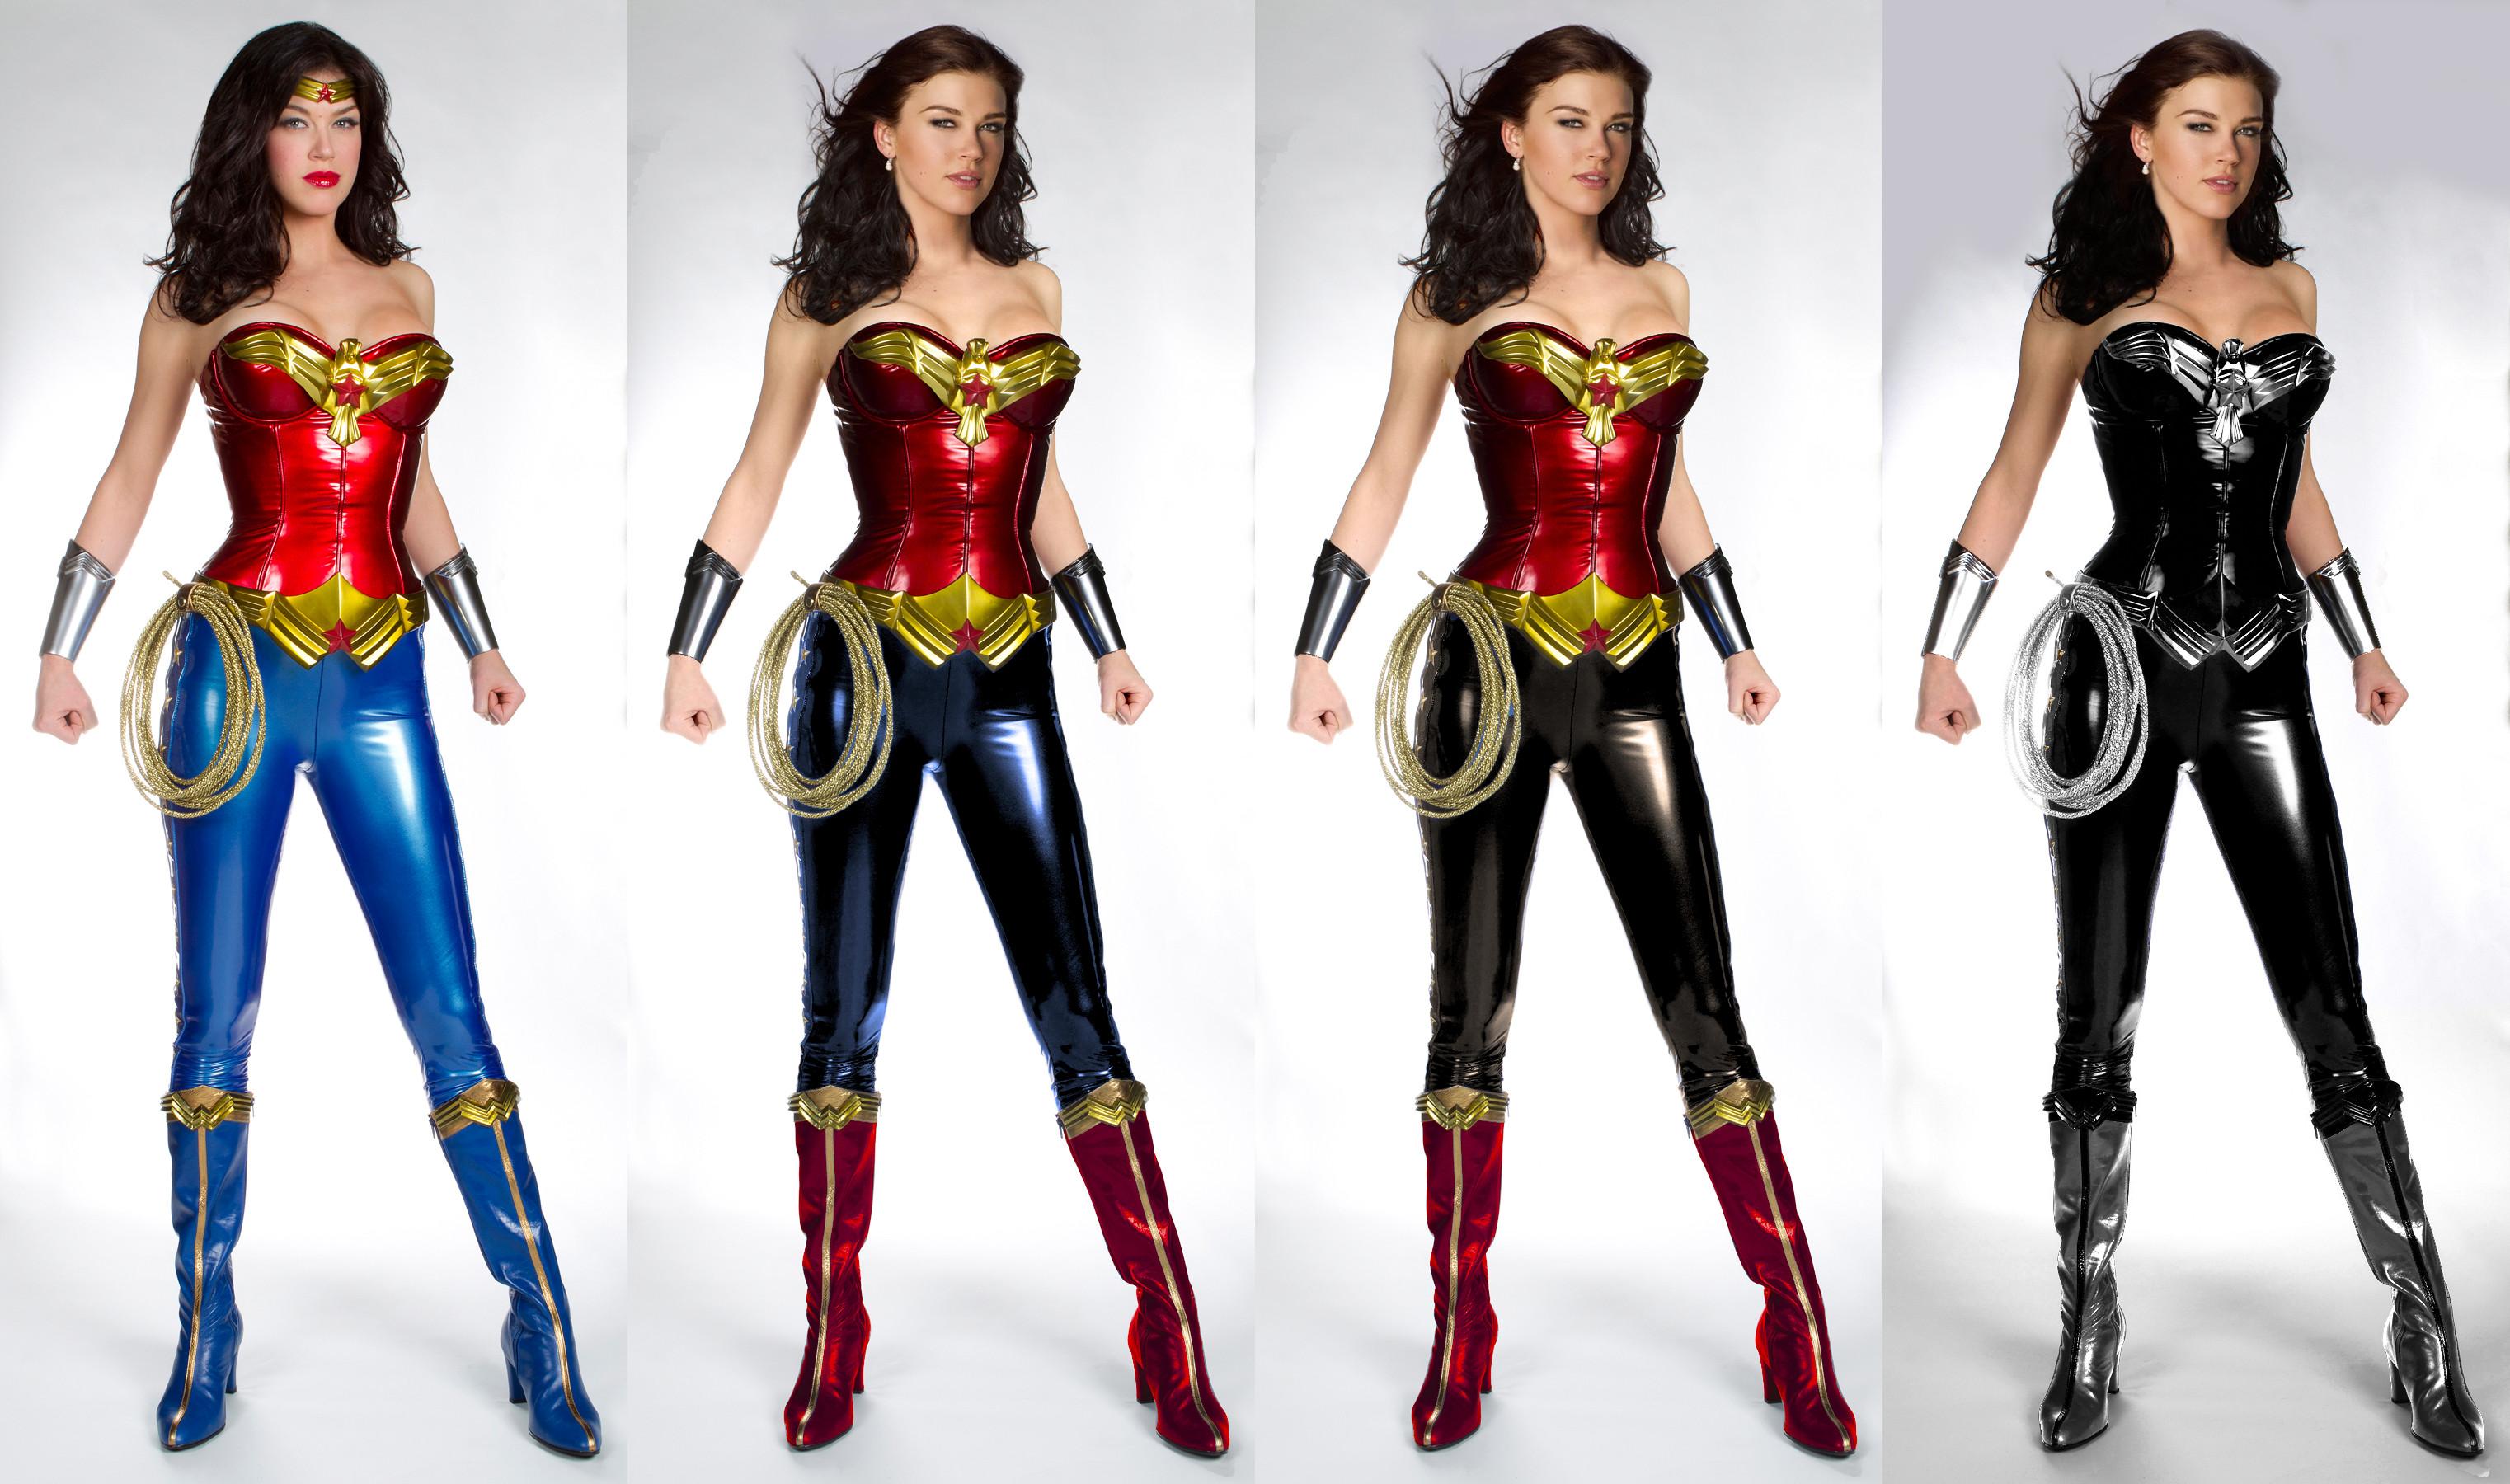 sc 1 st  Comic Book Movie & Wonder Womanu0027s costume